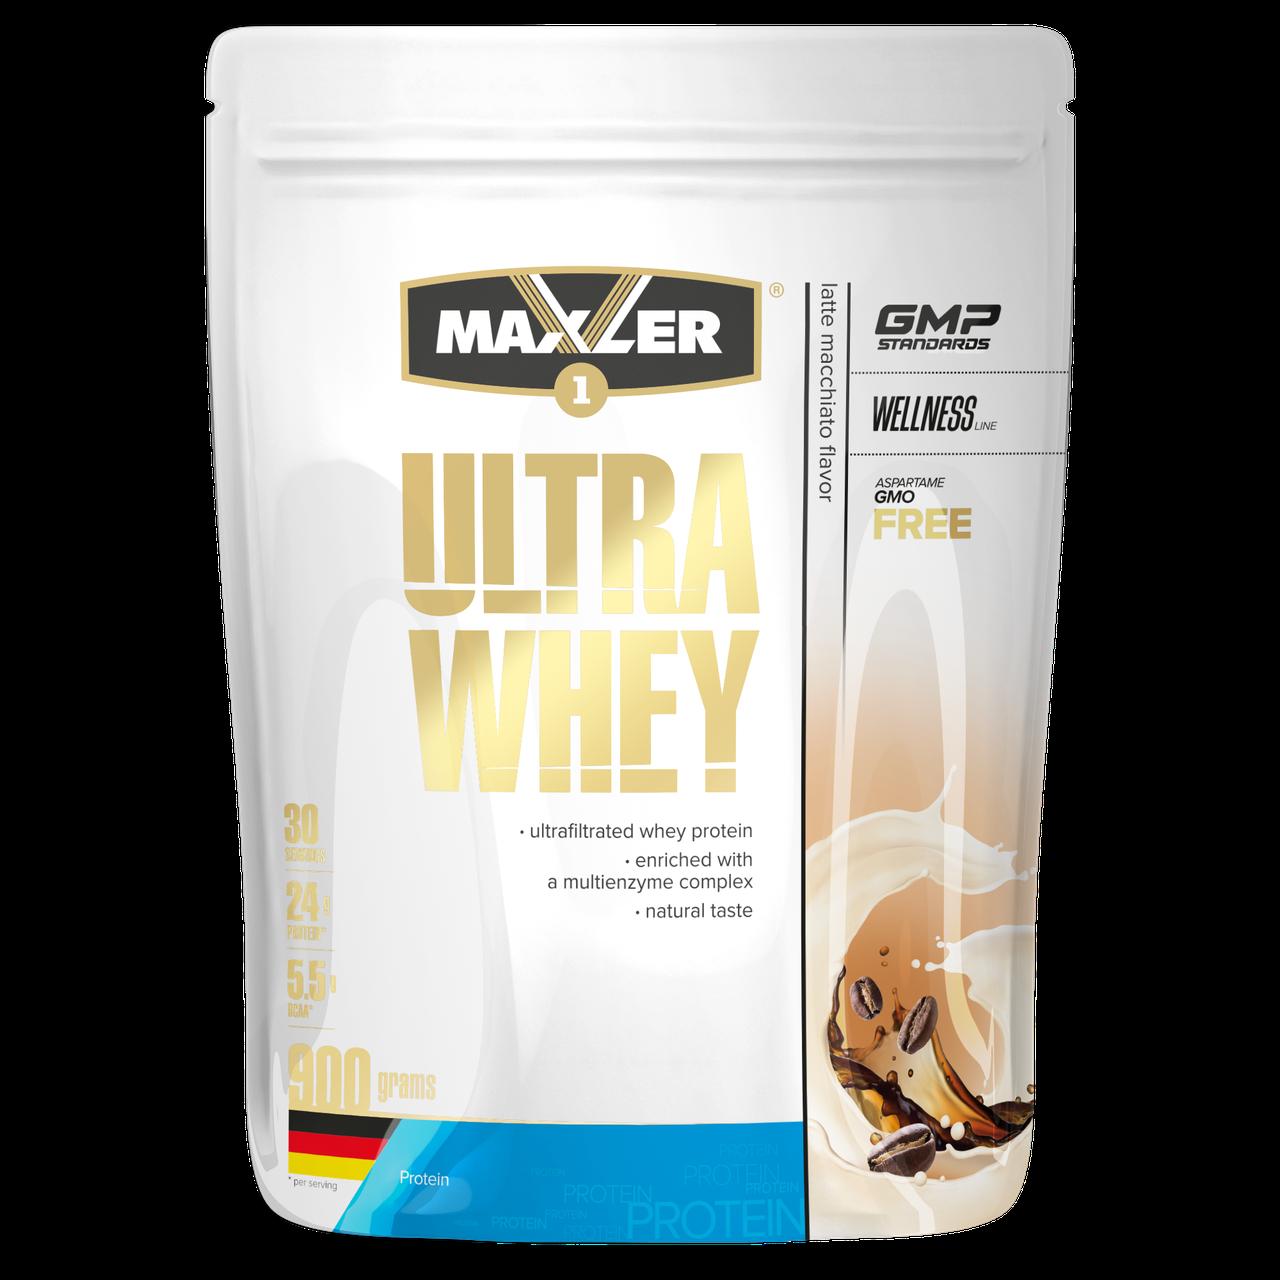 Max_Ultra Whey 900g пакет - latte macchiato